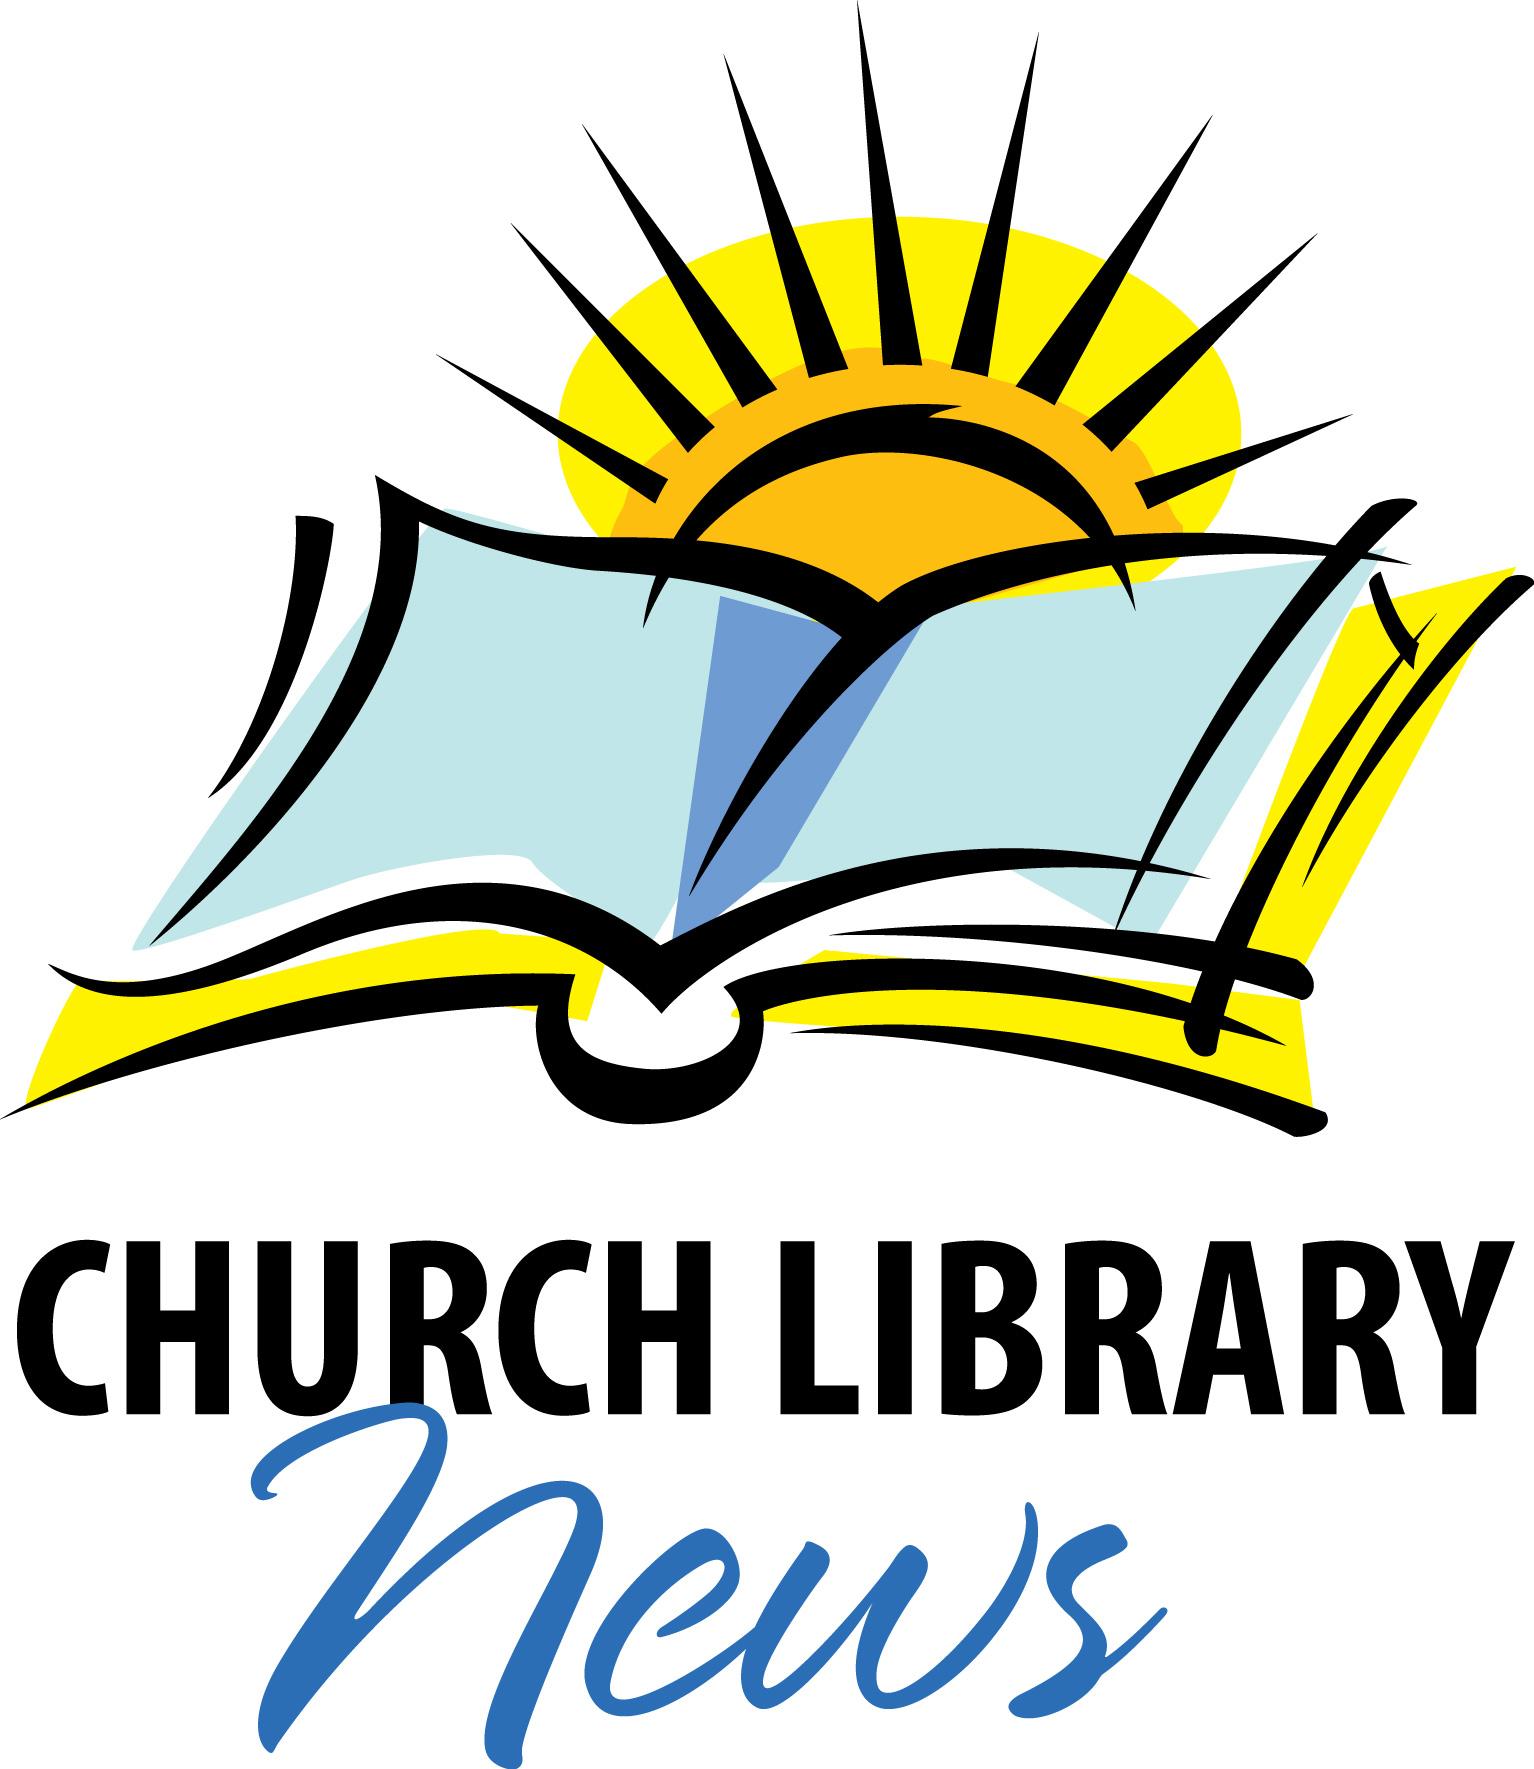 Library clipart news  Library Church Lutheran Pinnacle